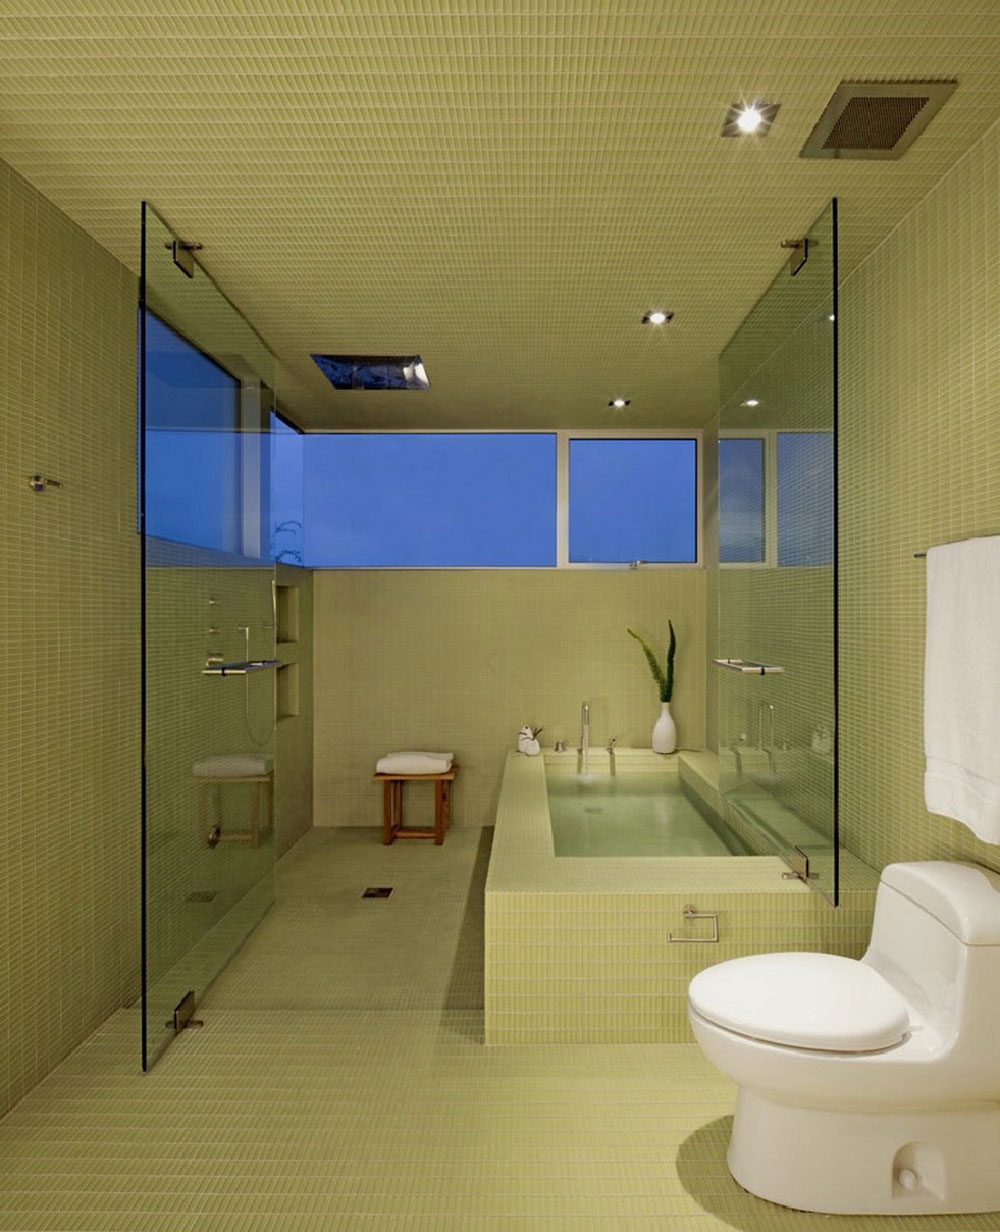 Badrum-interiör-design-stilar-att-se-11-badrum-interiör-design-stilar-att-se upp